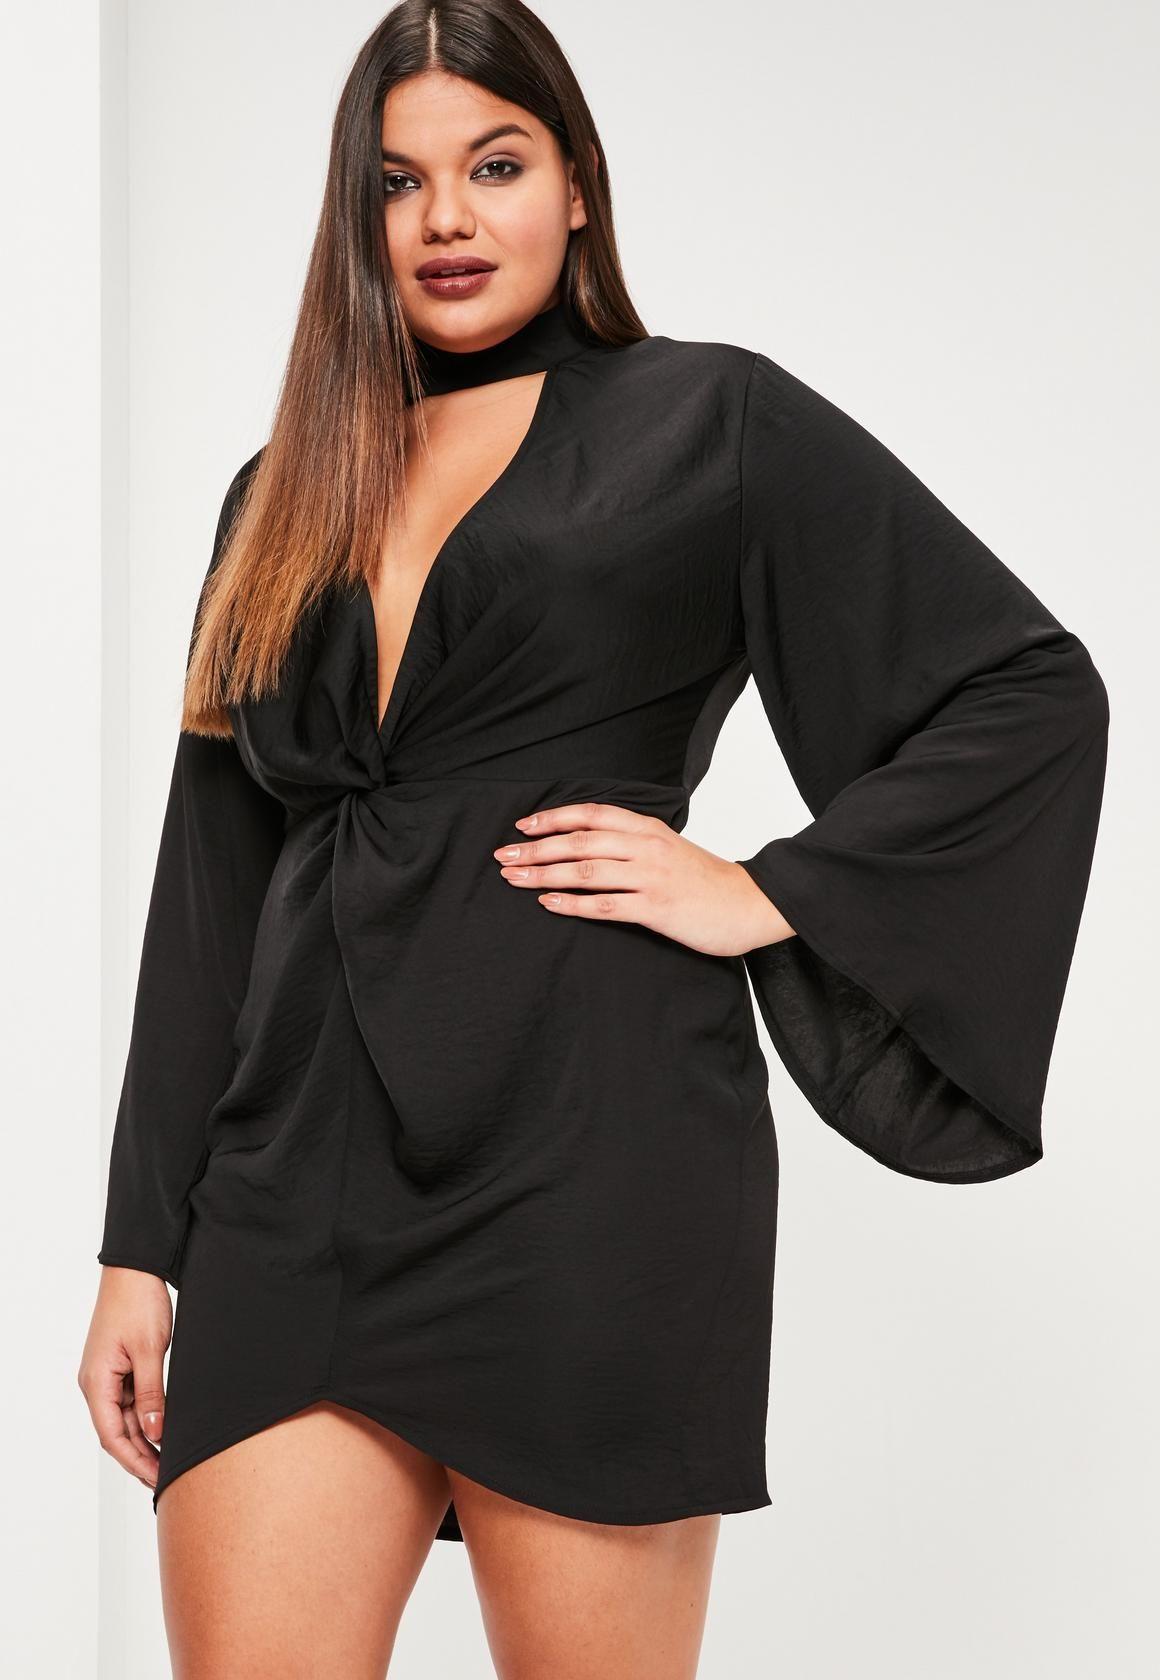 Missguided Curve Black Hammered Satin Tab Neck Dress